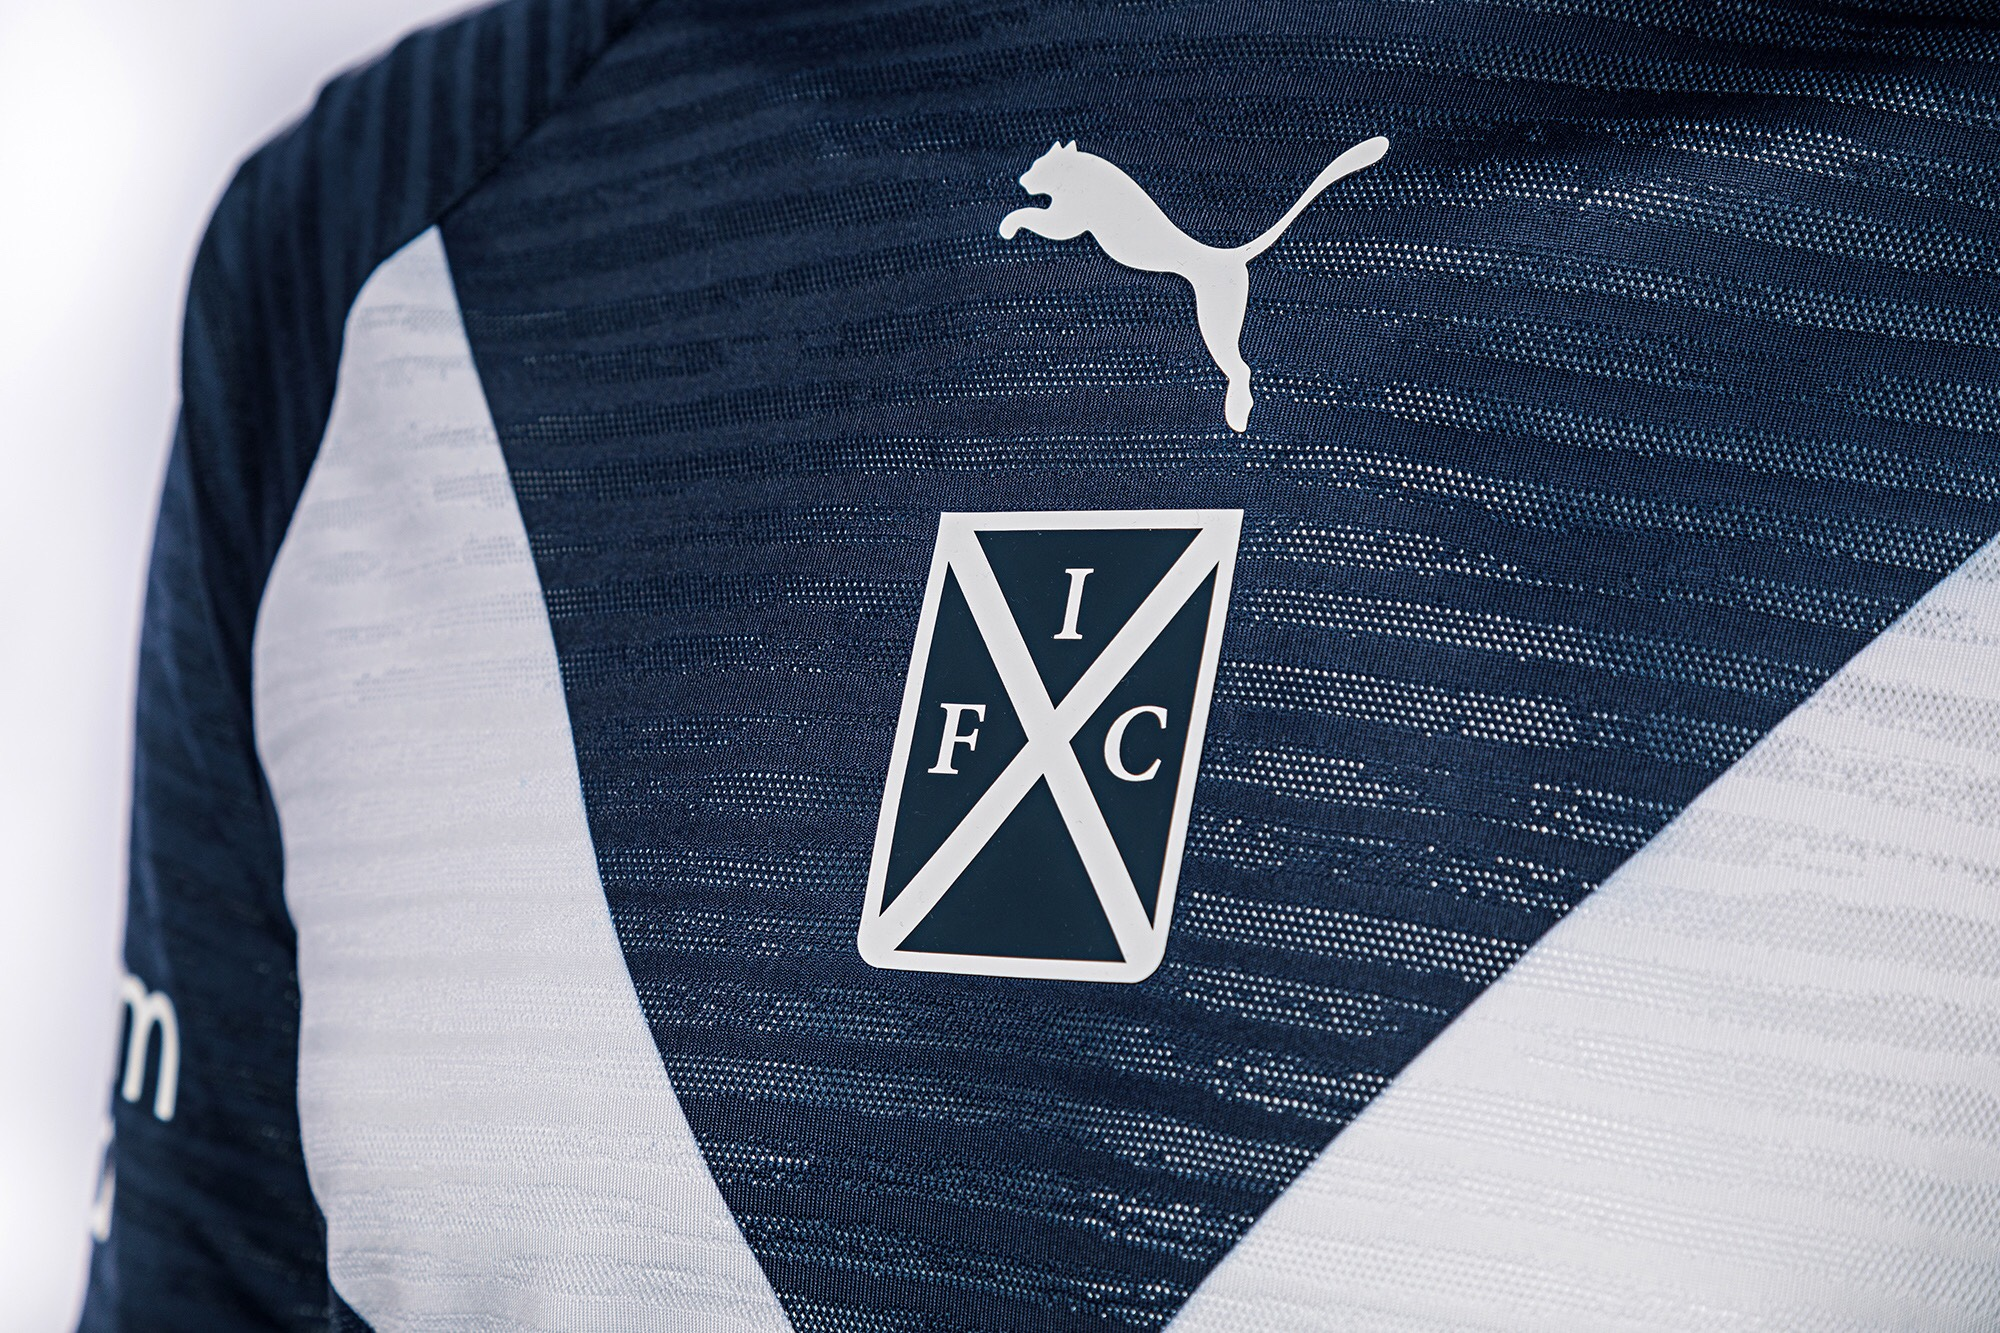 C.A. Independiente 2019-20 Puma Third Kit